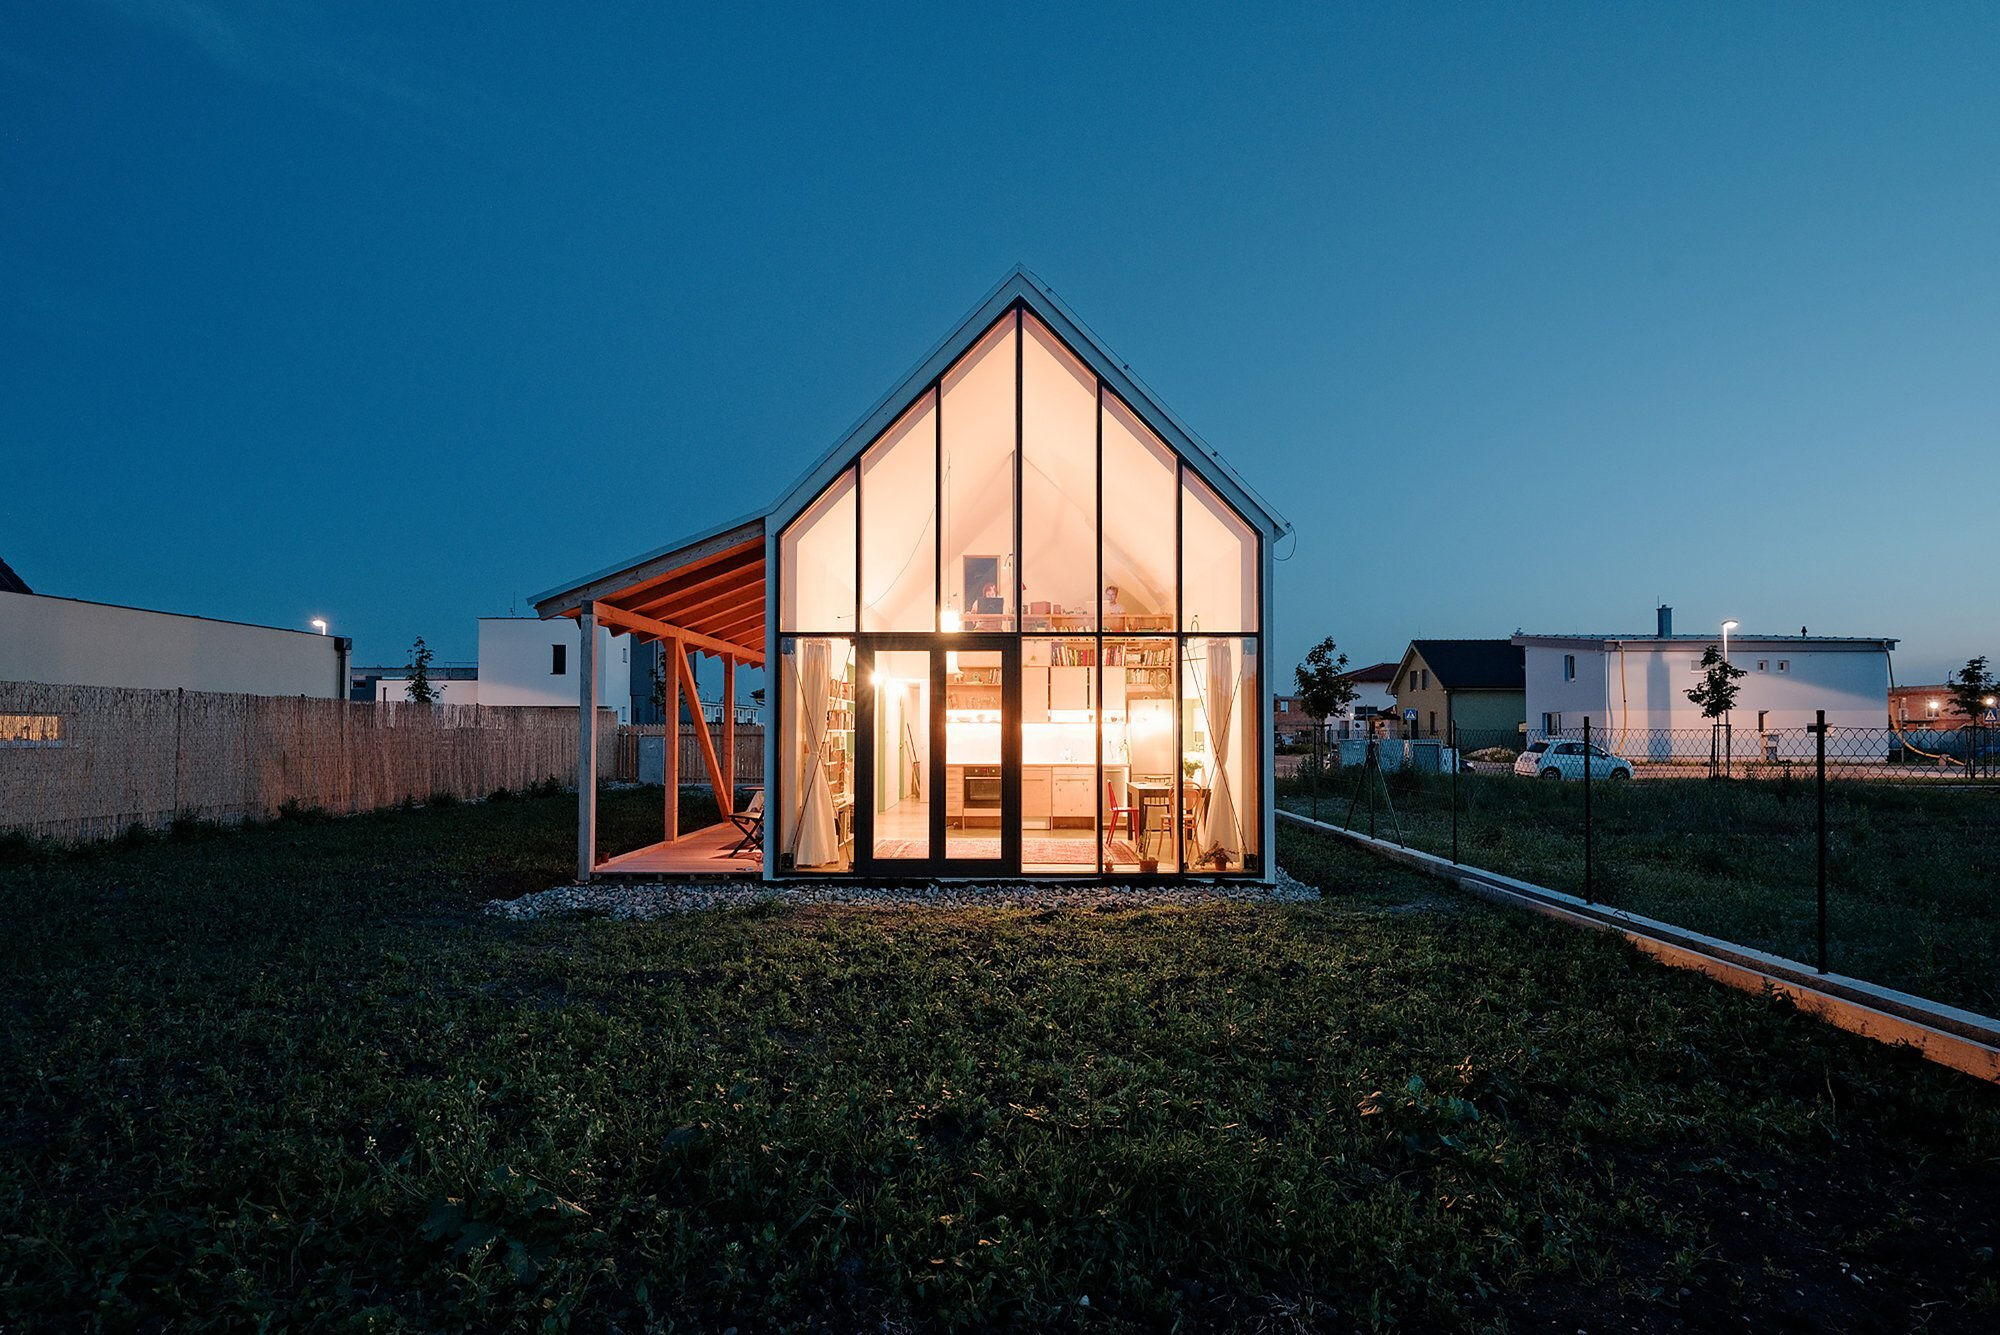 IST-Family House - JRKVC - Slovakia - Small House - Exterior Night - Humble Homes